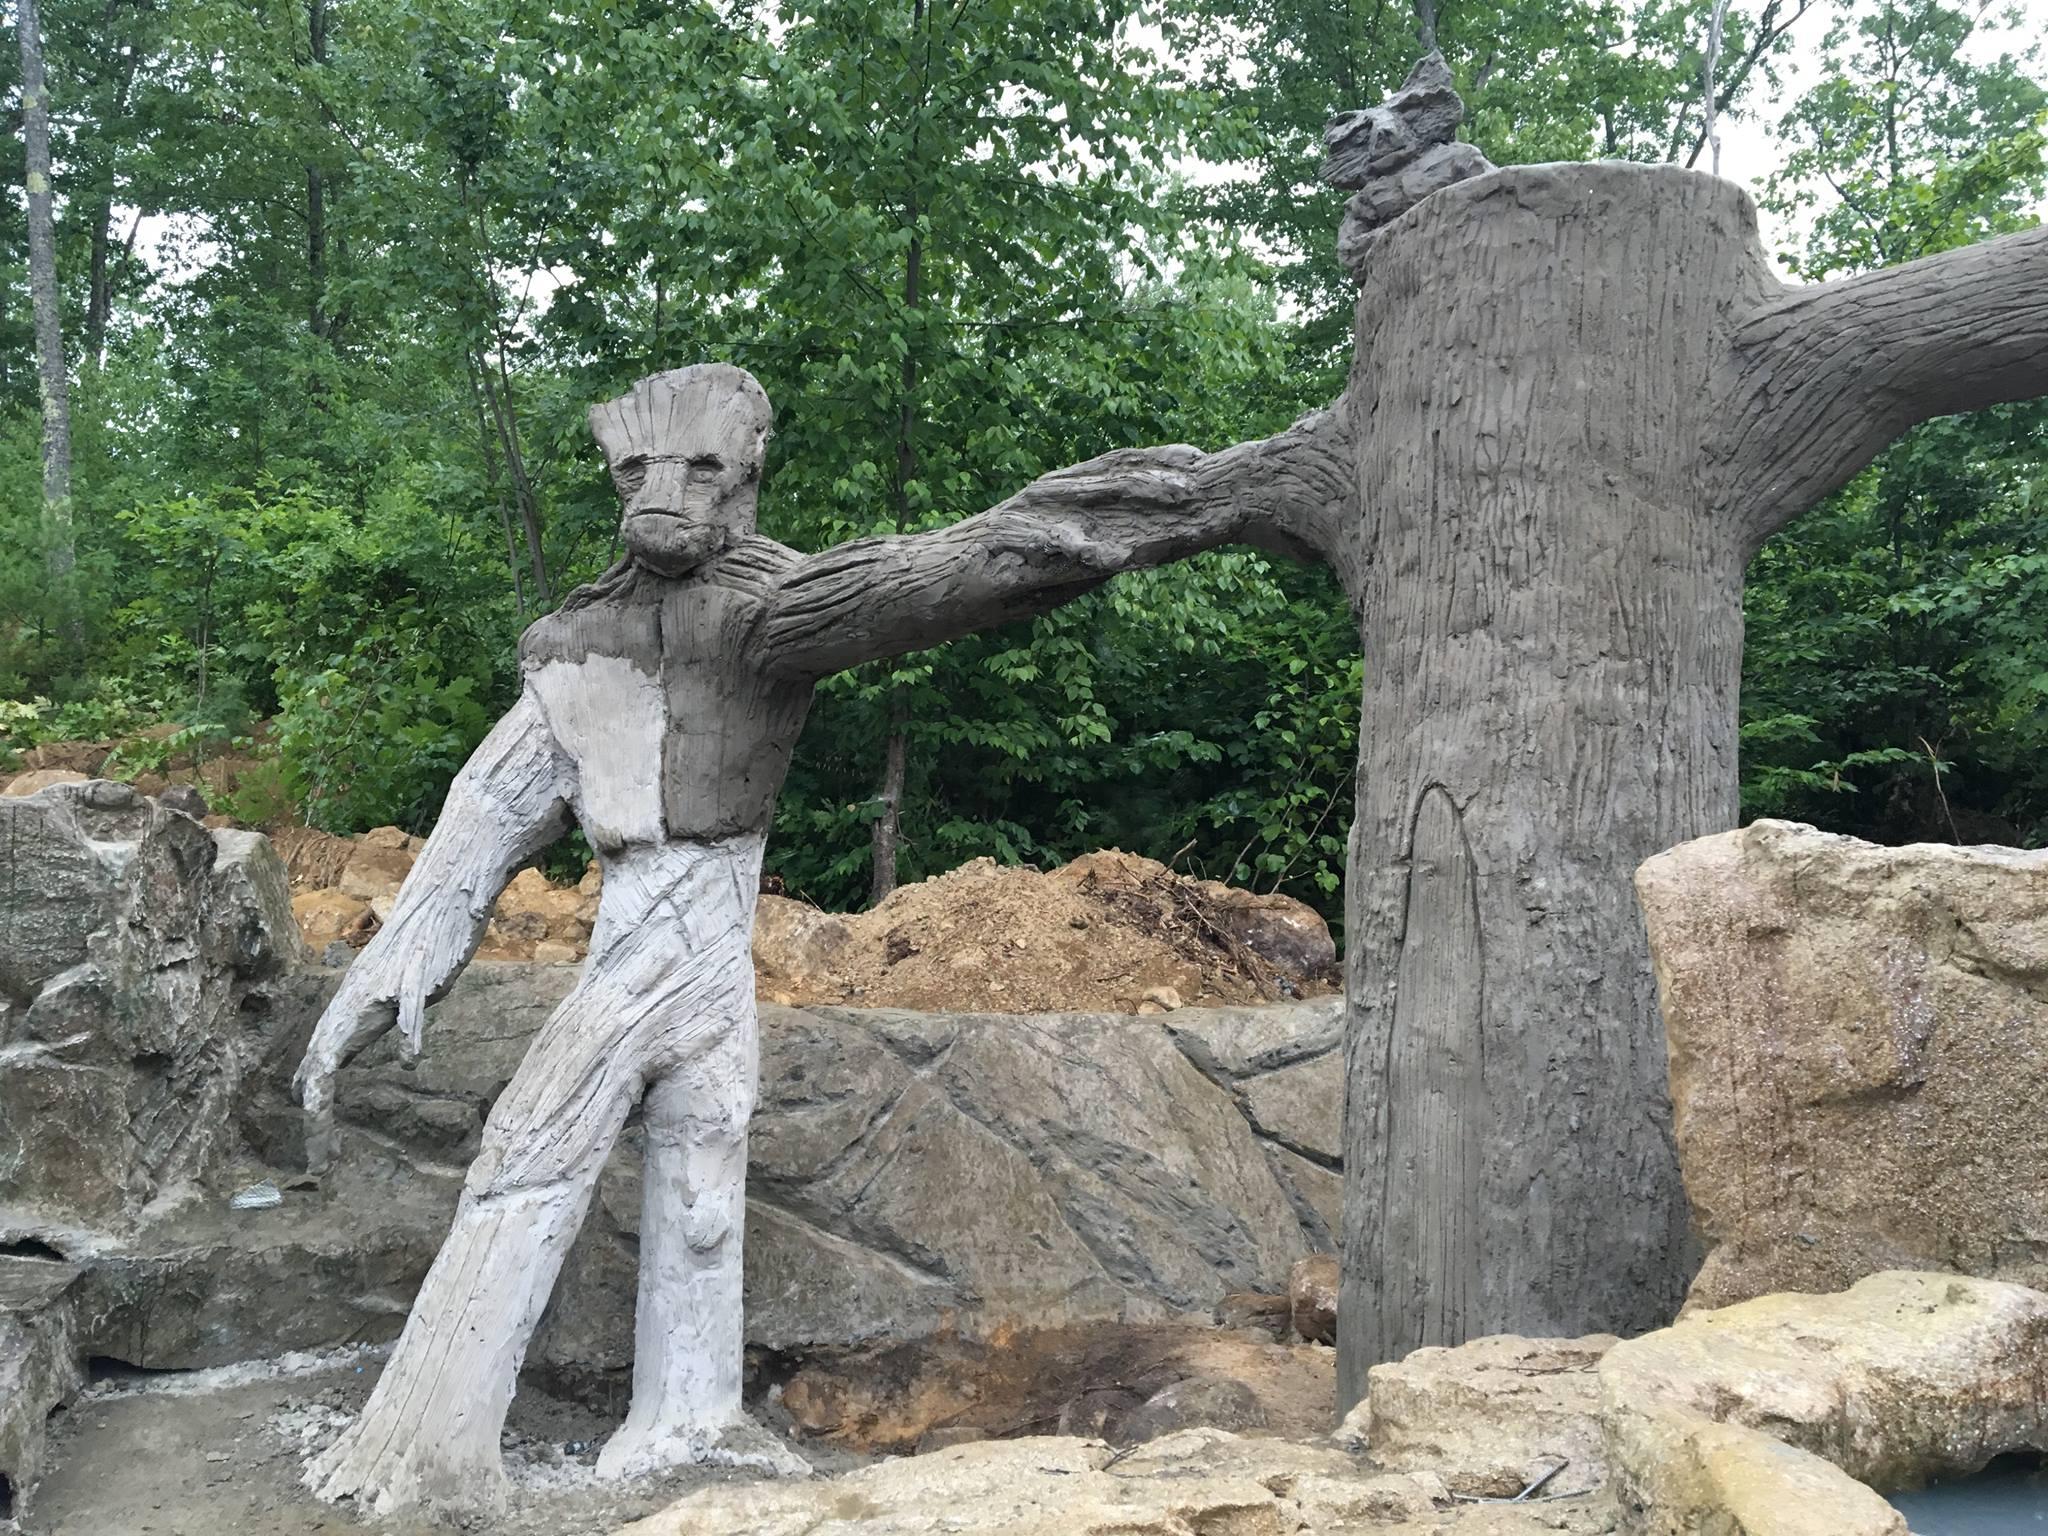 Treetrunk with Groot & Rocket Racoon